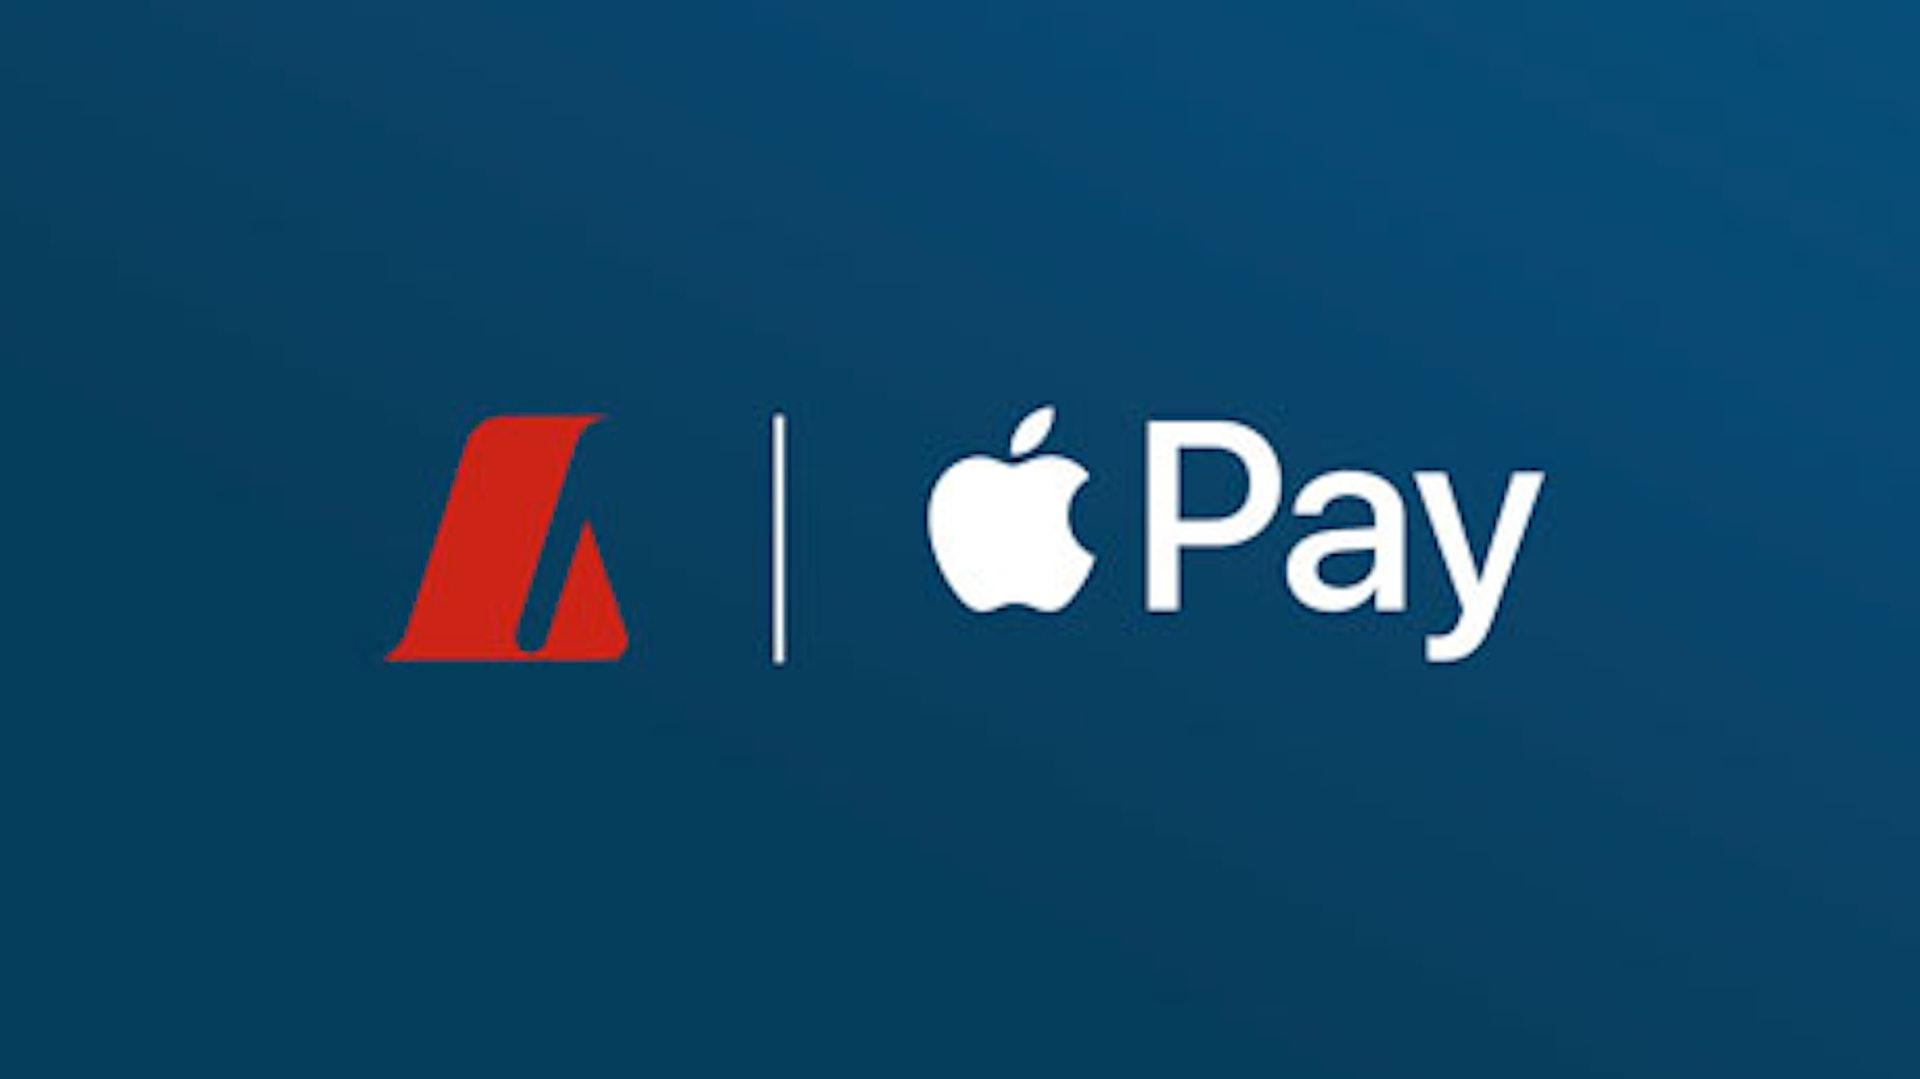 Landsbankinn + Apple Pay